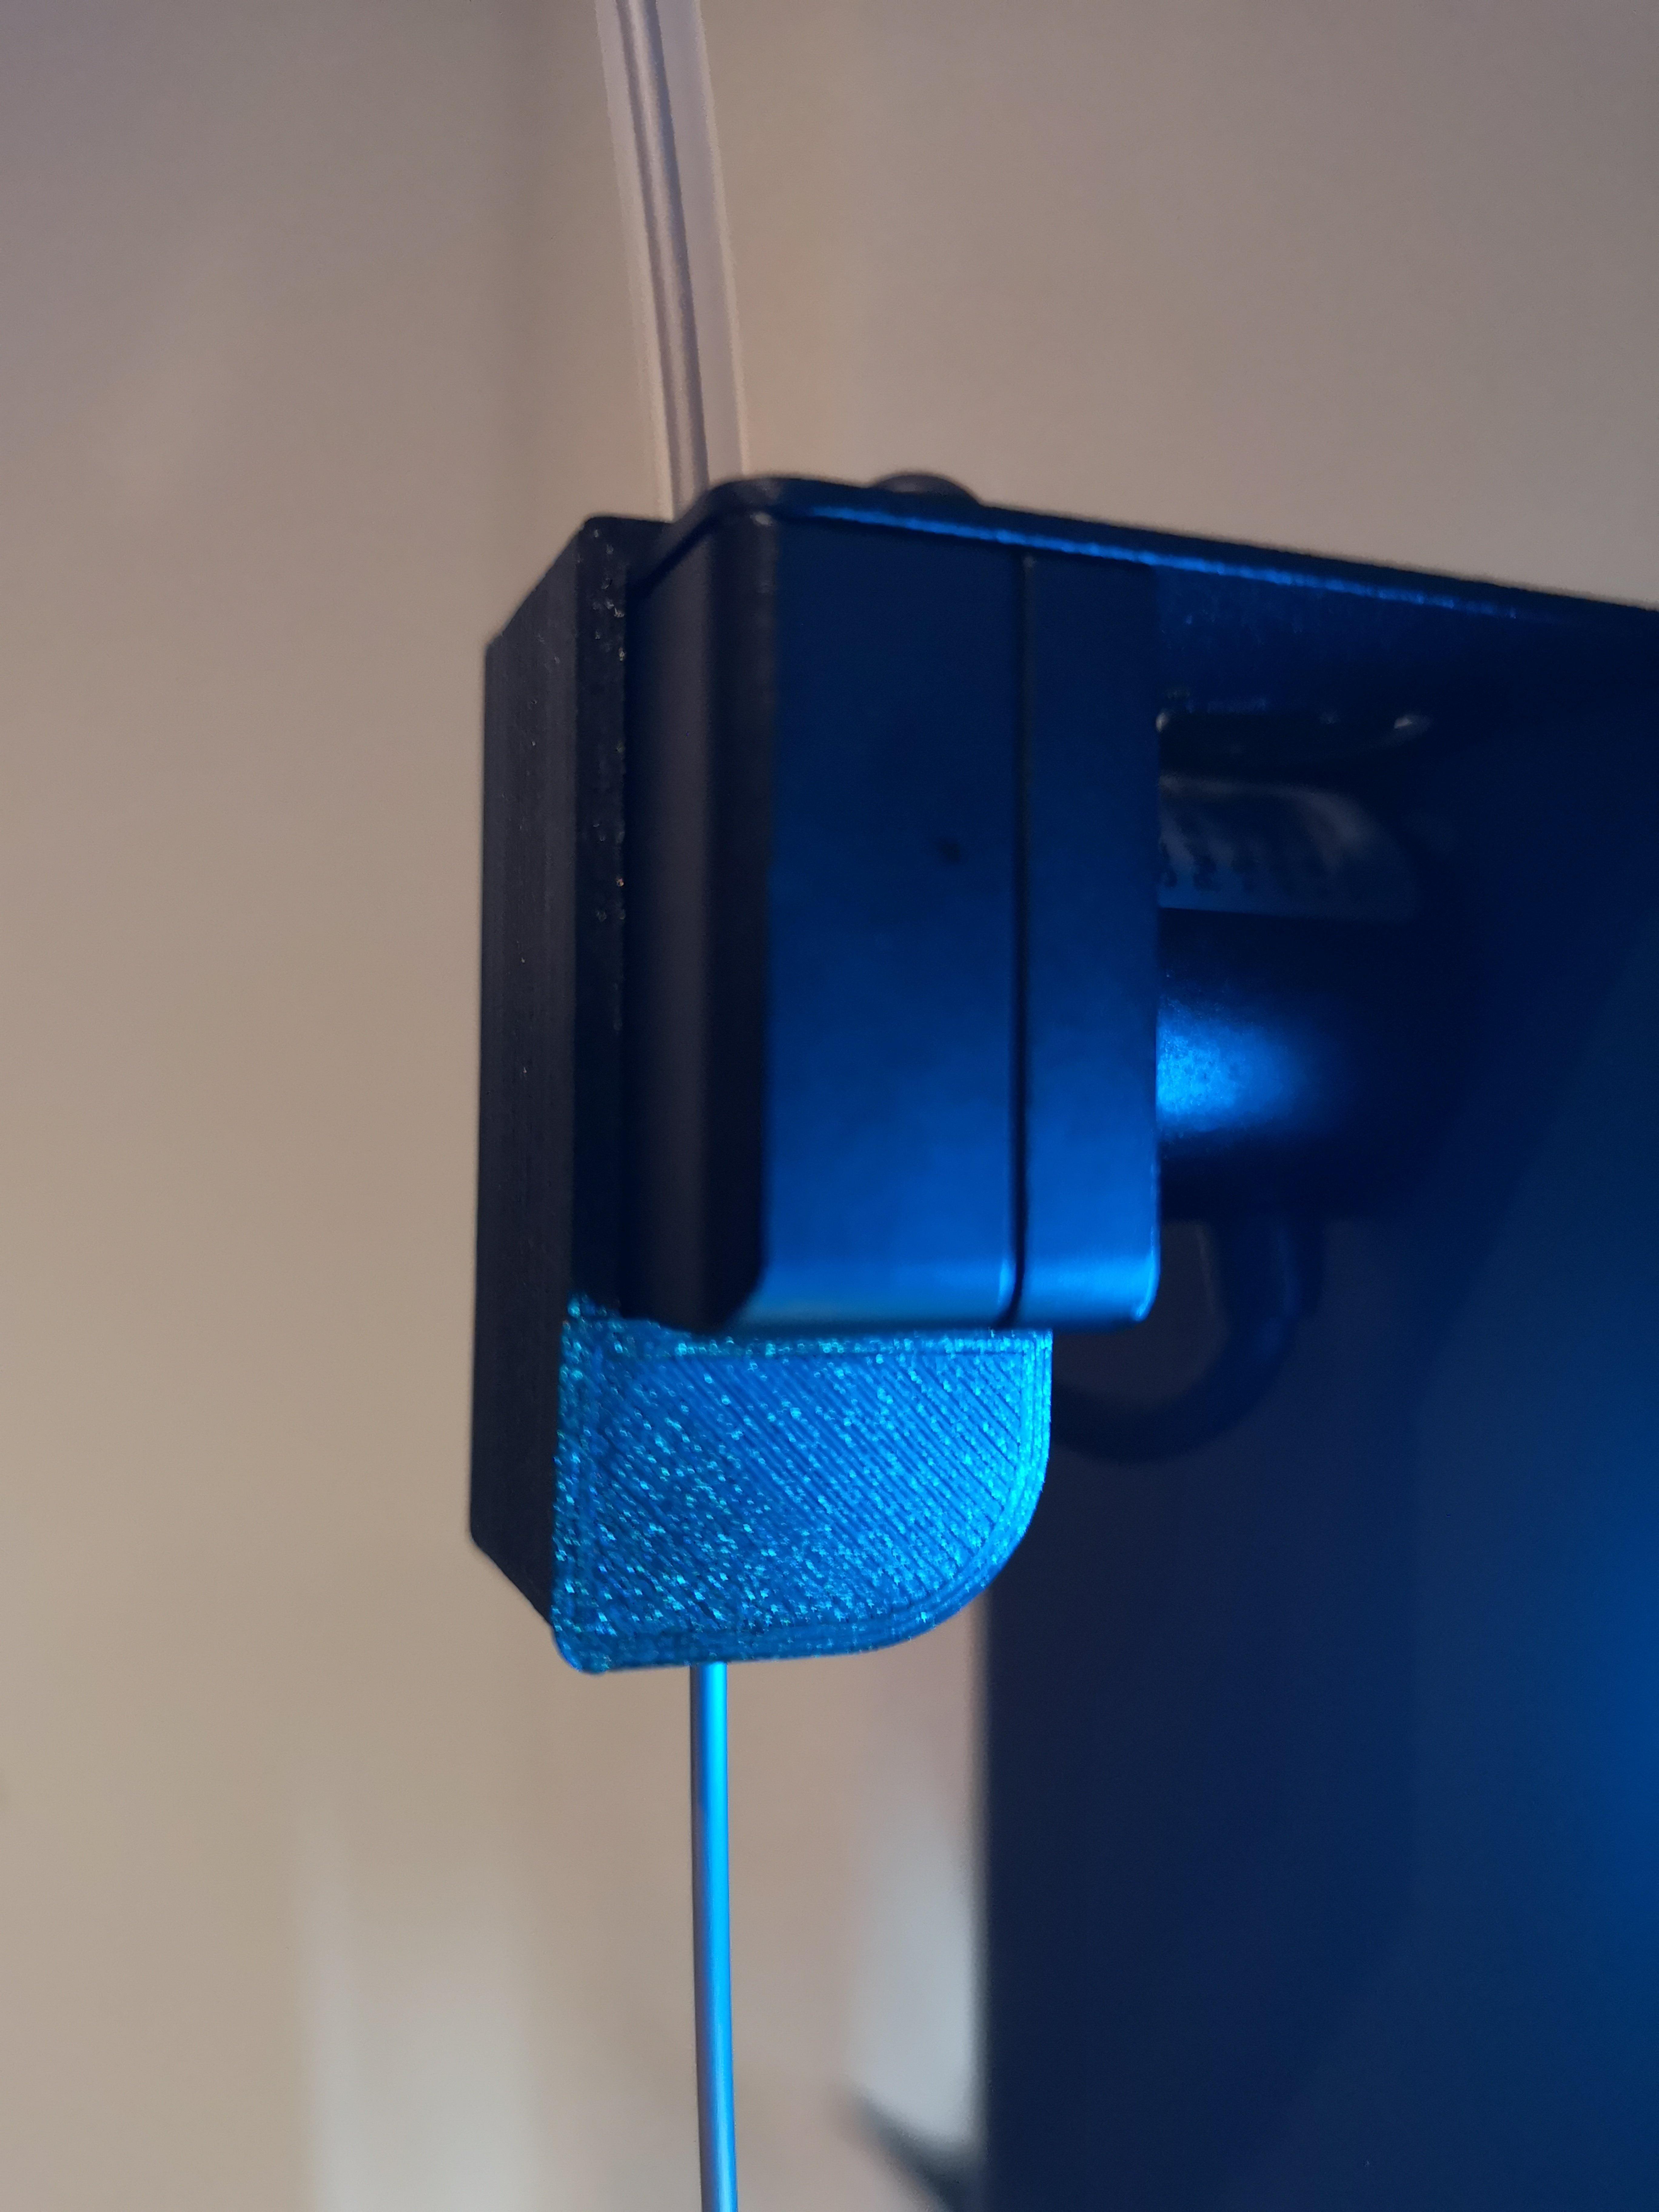 Craftbot 3 Clip-on Filament Filter